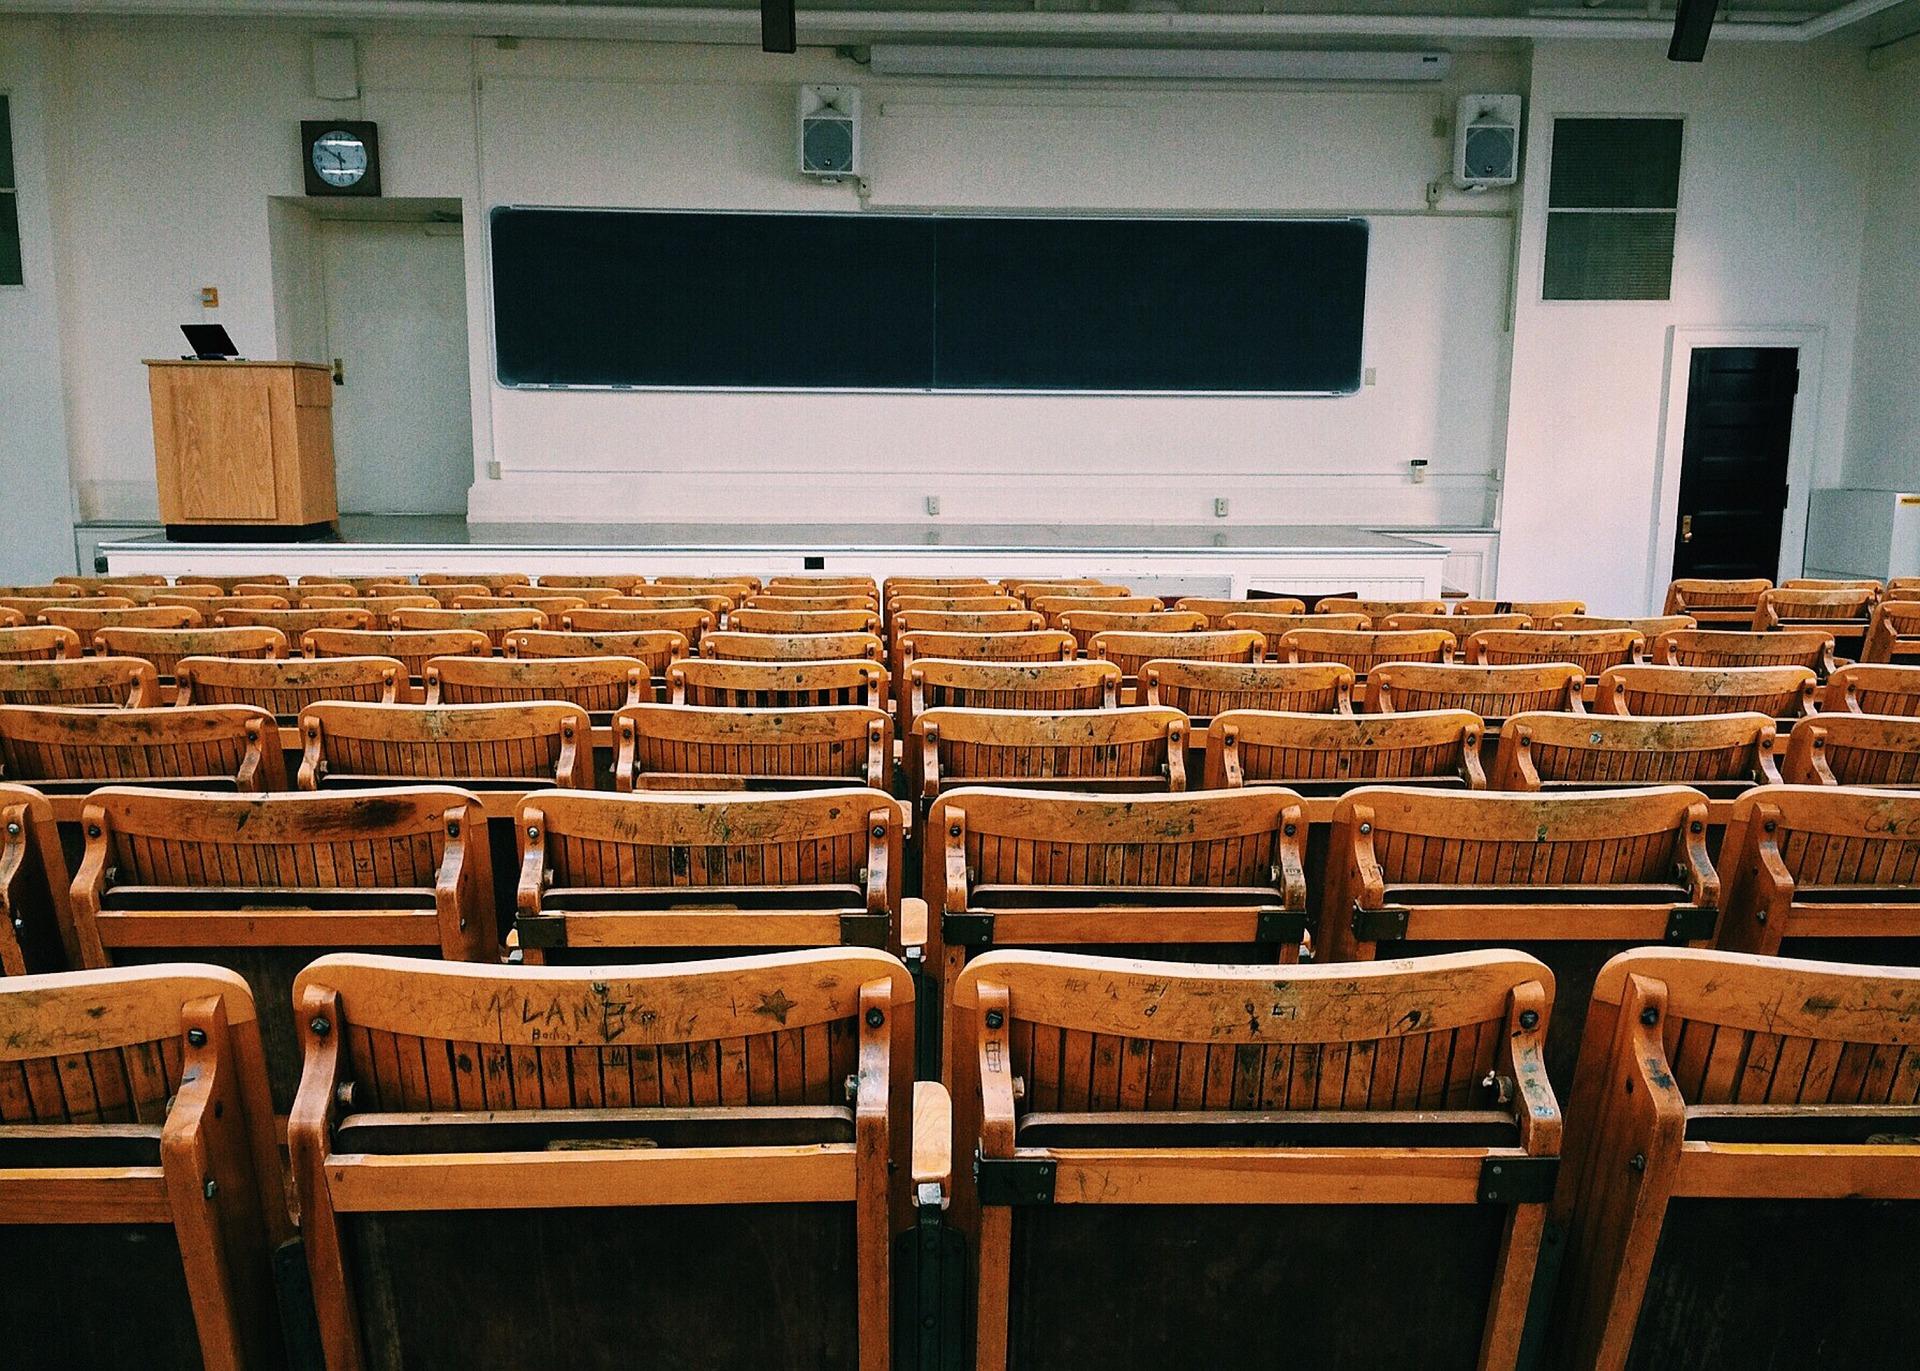 classroom-1699745_1920.jpg